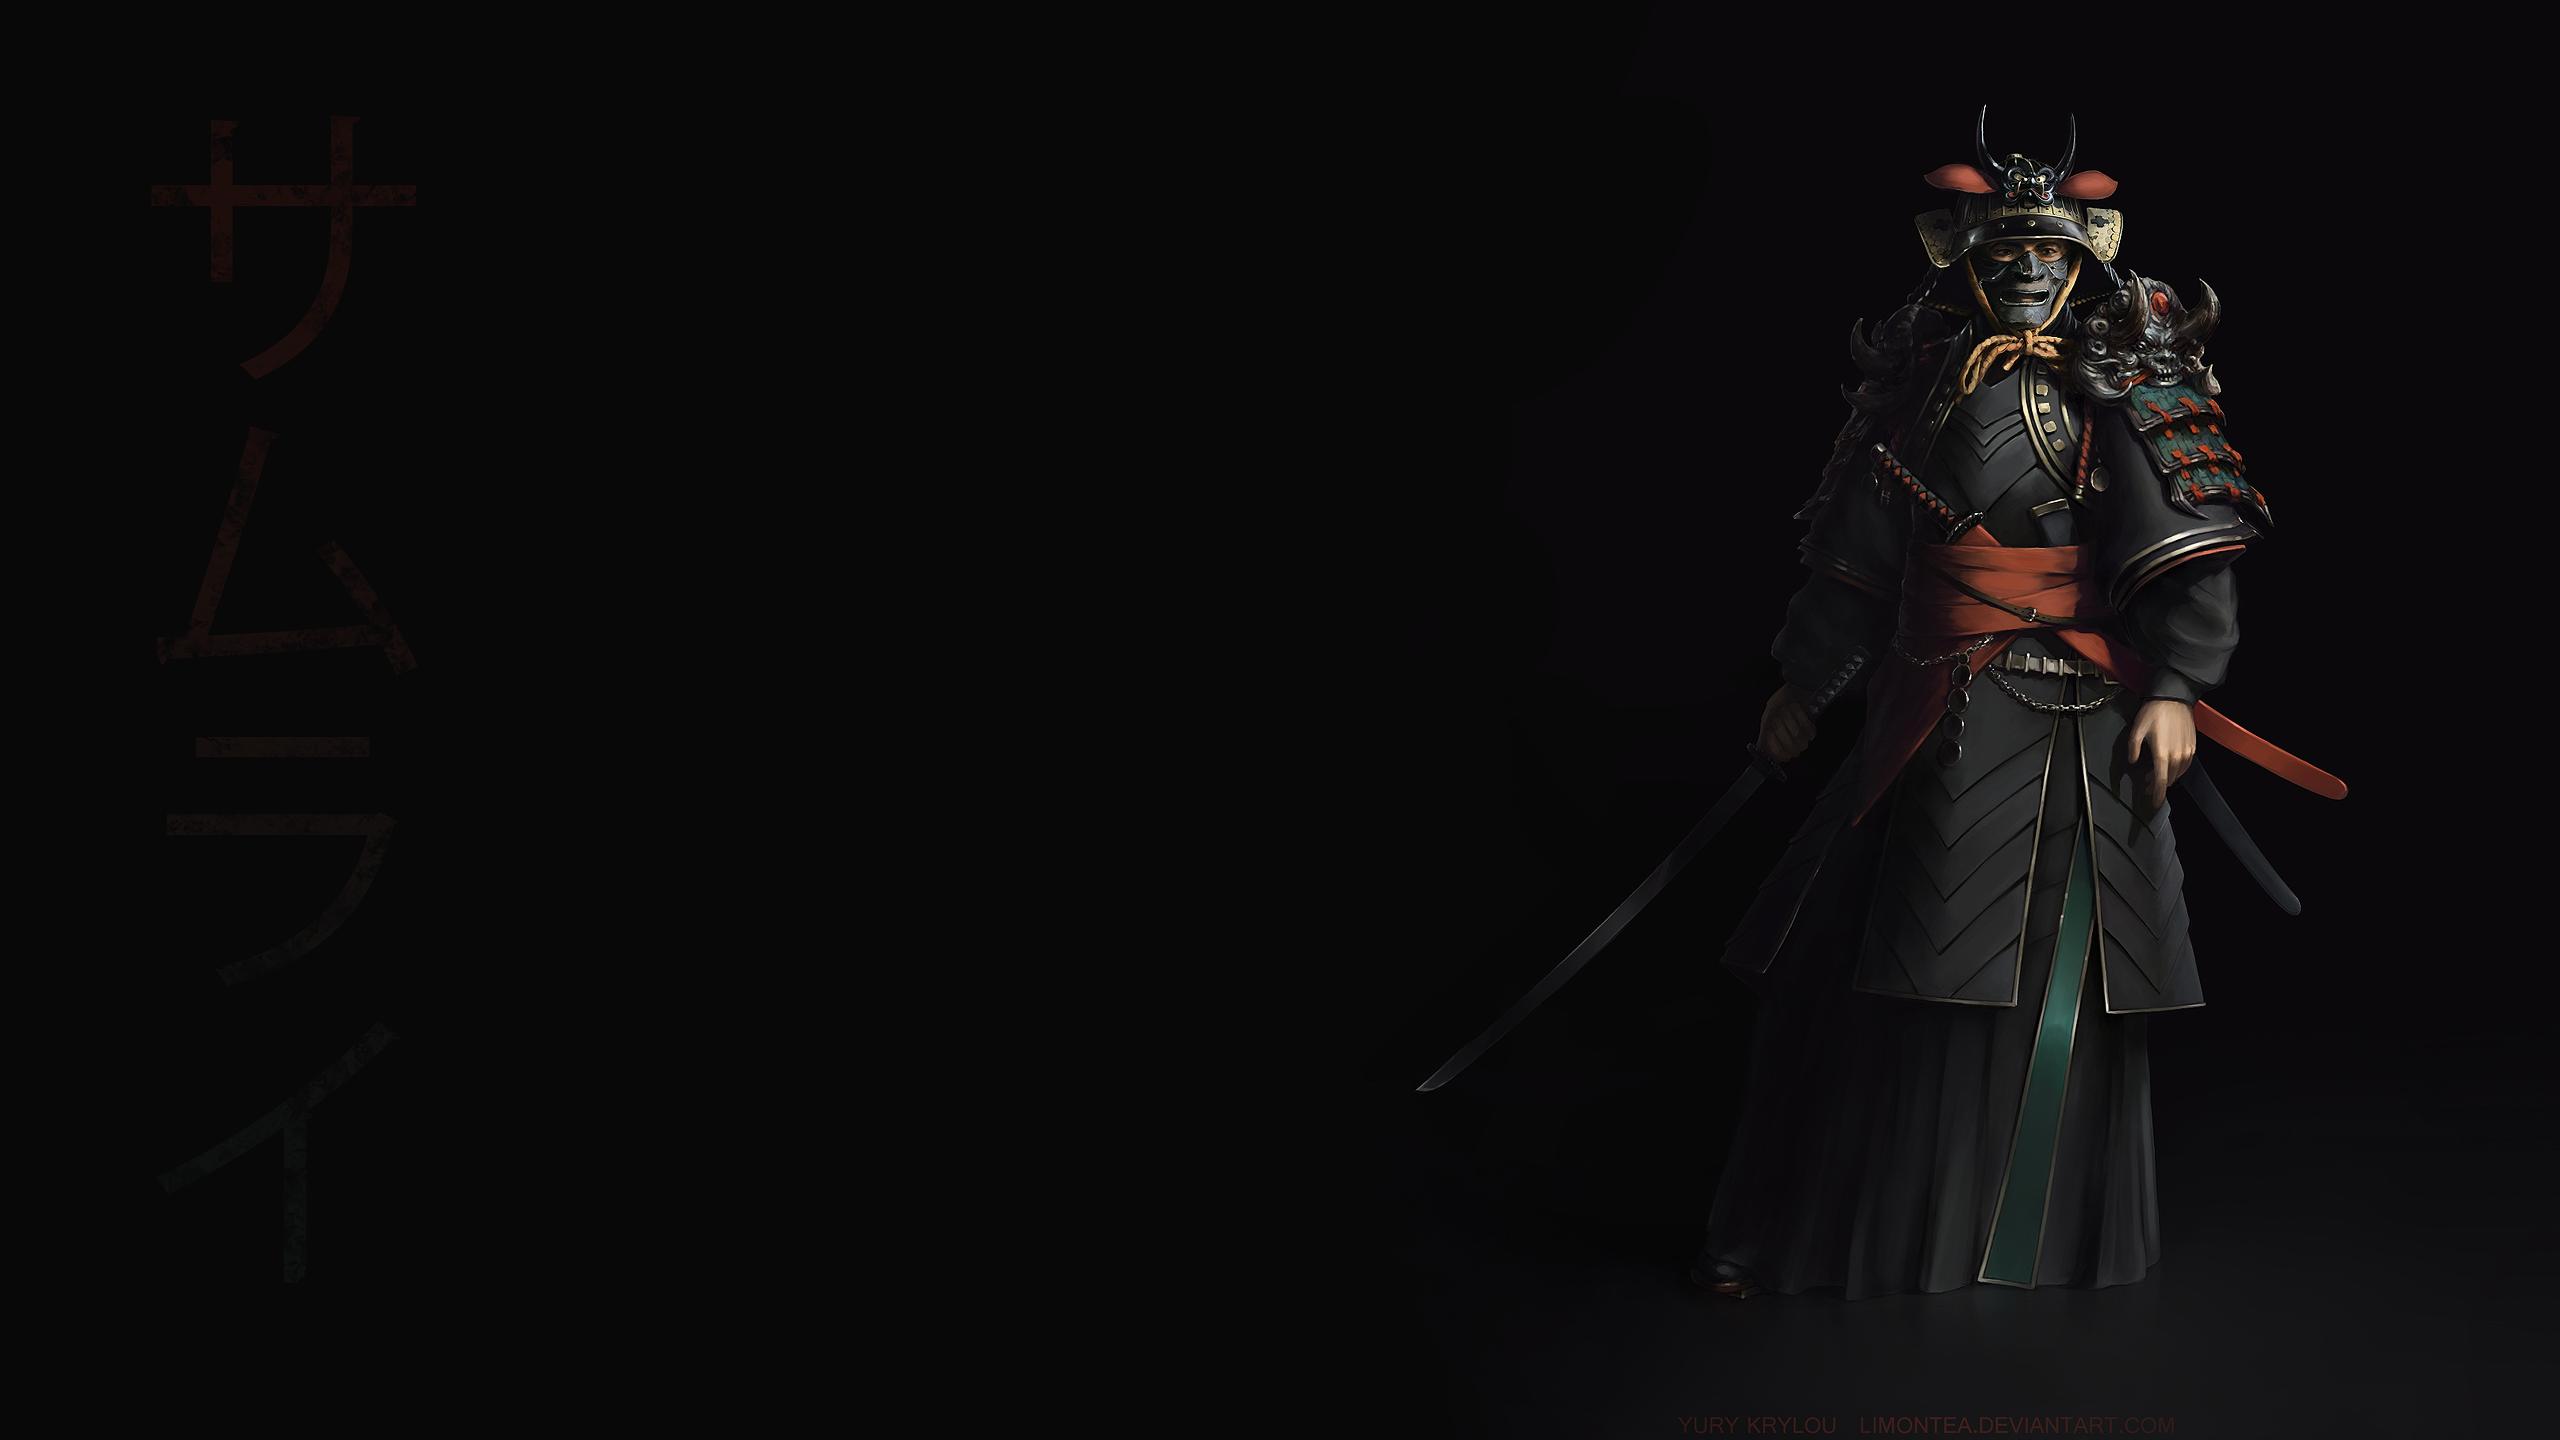 Samurai Wallpaper by LimonTea on DeviantArt